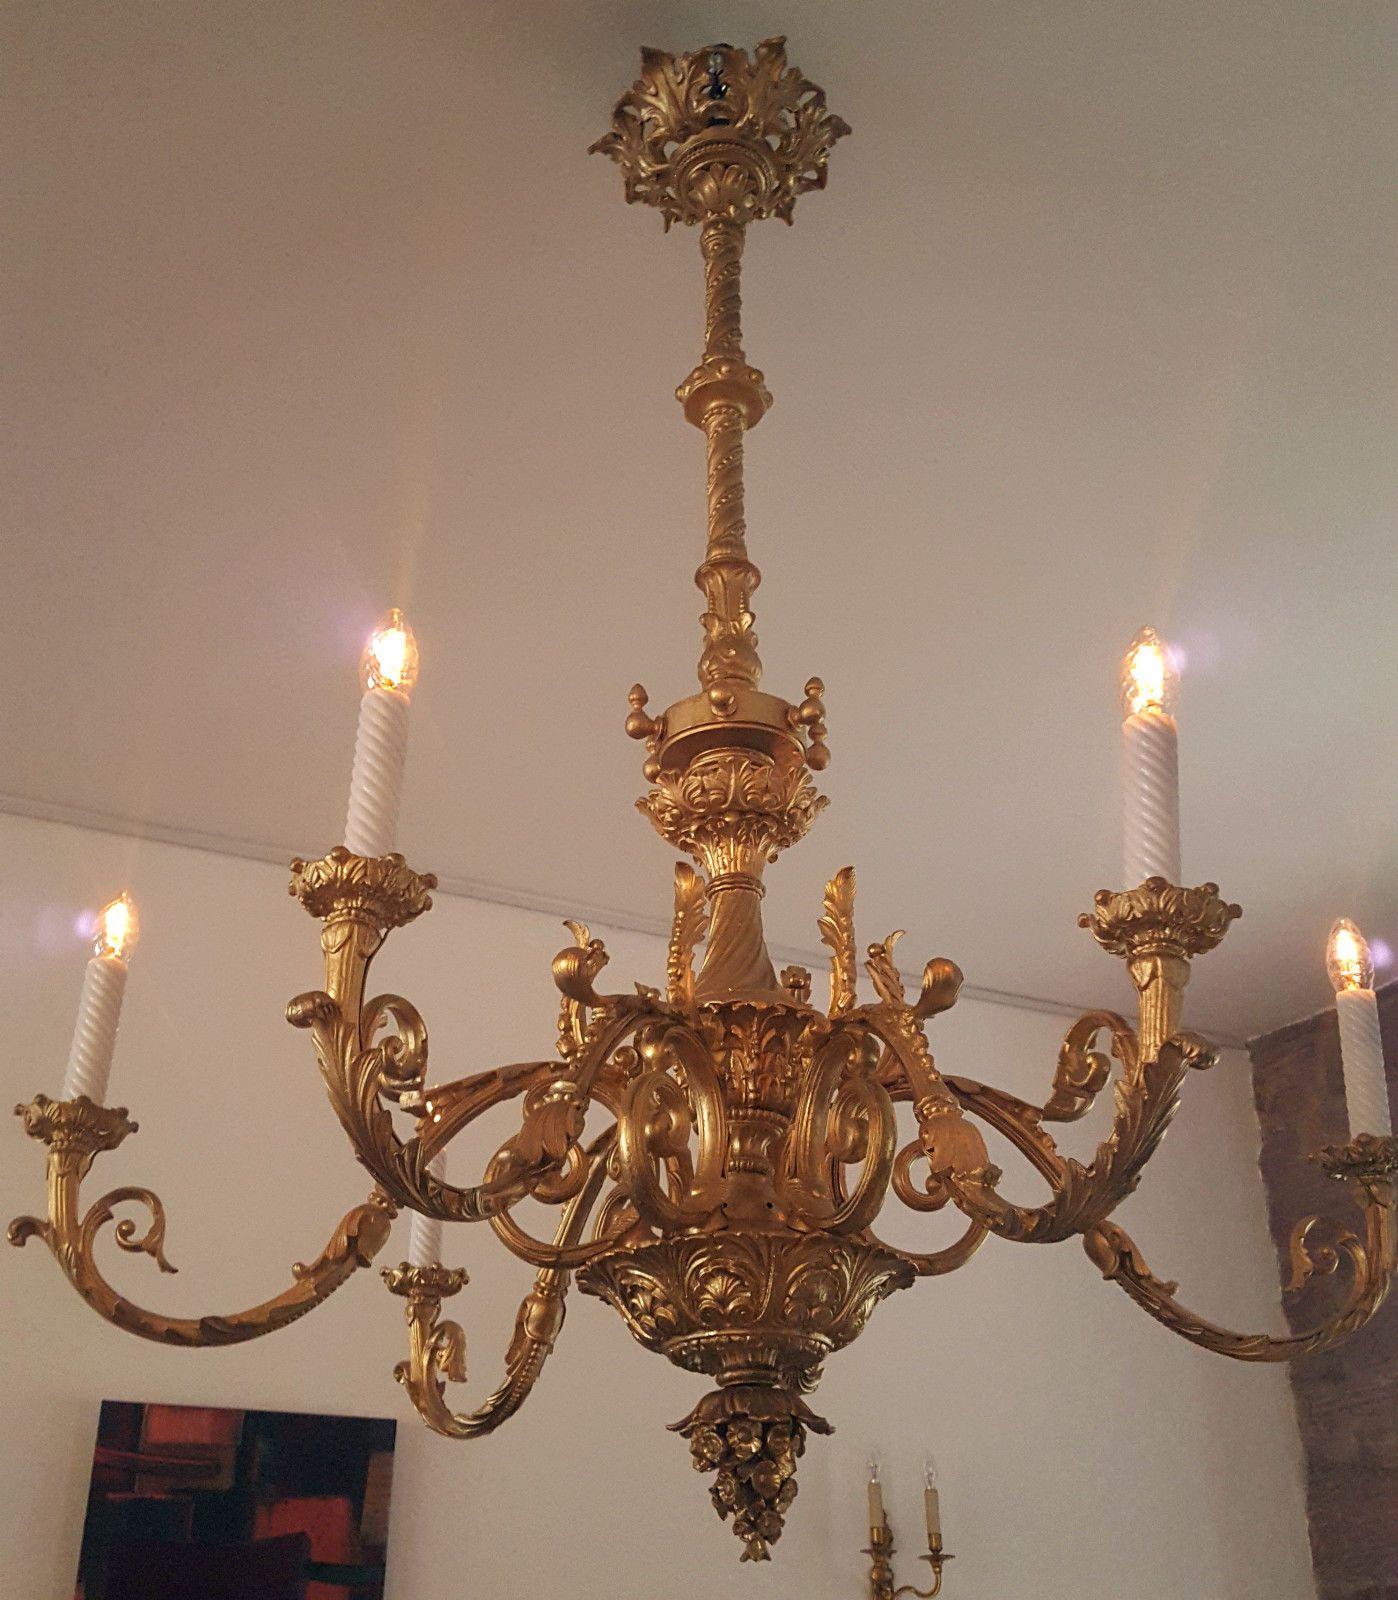 paar kronleuchter antik lster pair chandelier antique barock baroque louis xiv ebay - Kronleuchter Antik